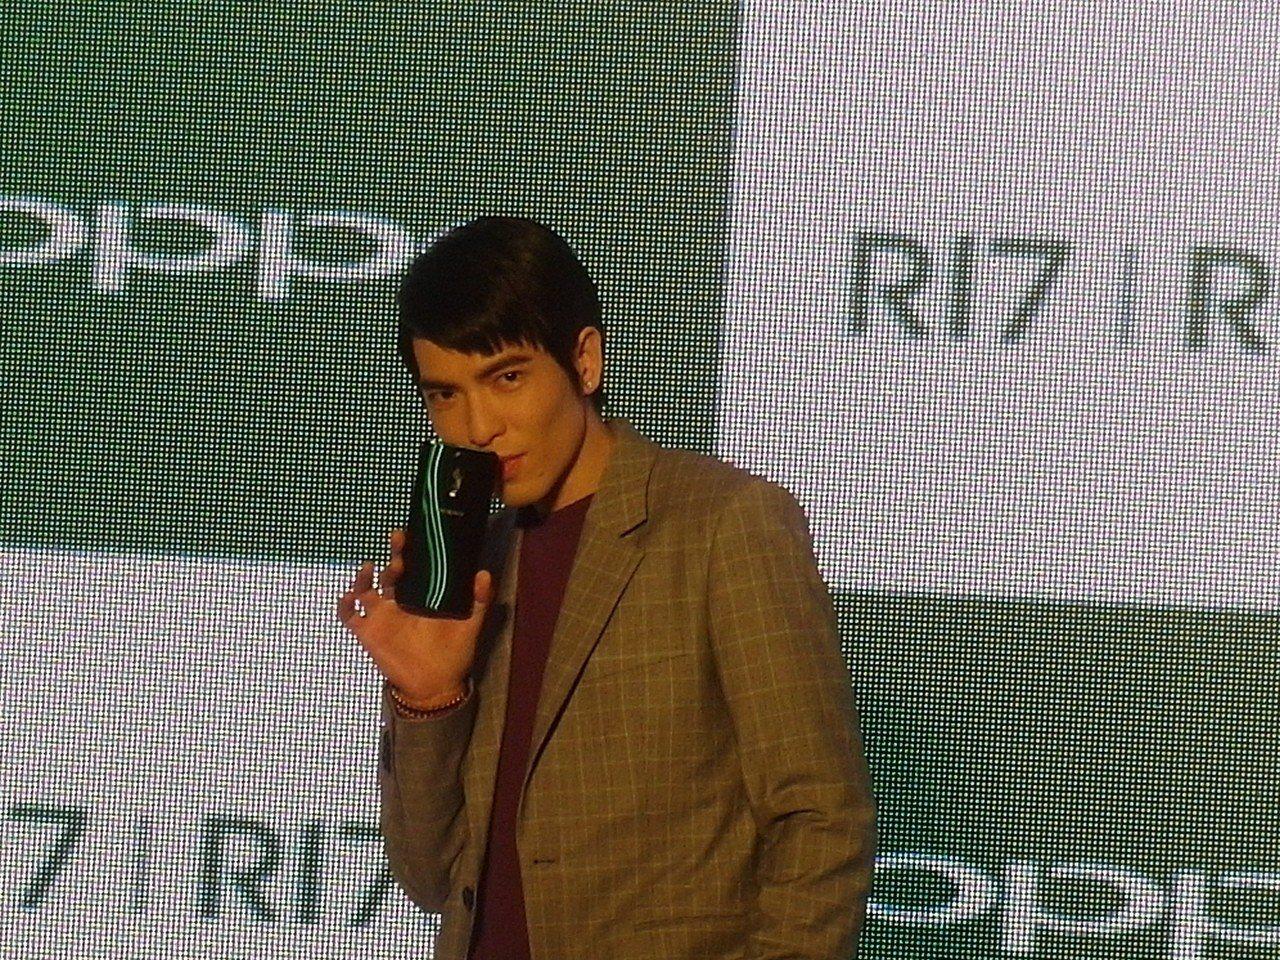 OPPO發表R17系列,藝人蕭敬騰站台分享R17的魅力。 記者何佩儒/攝影